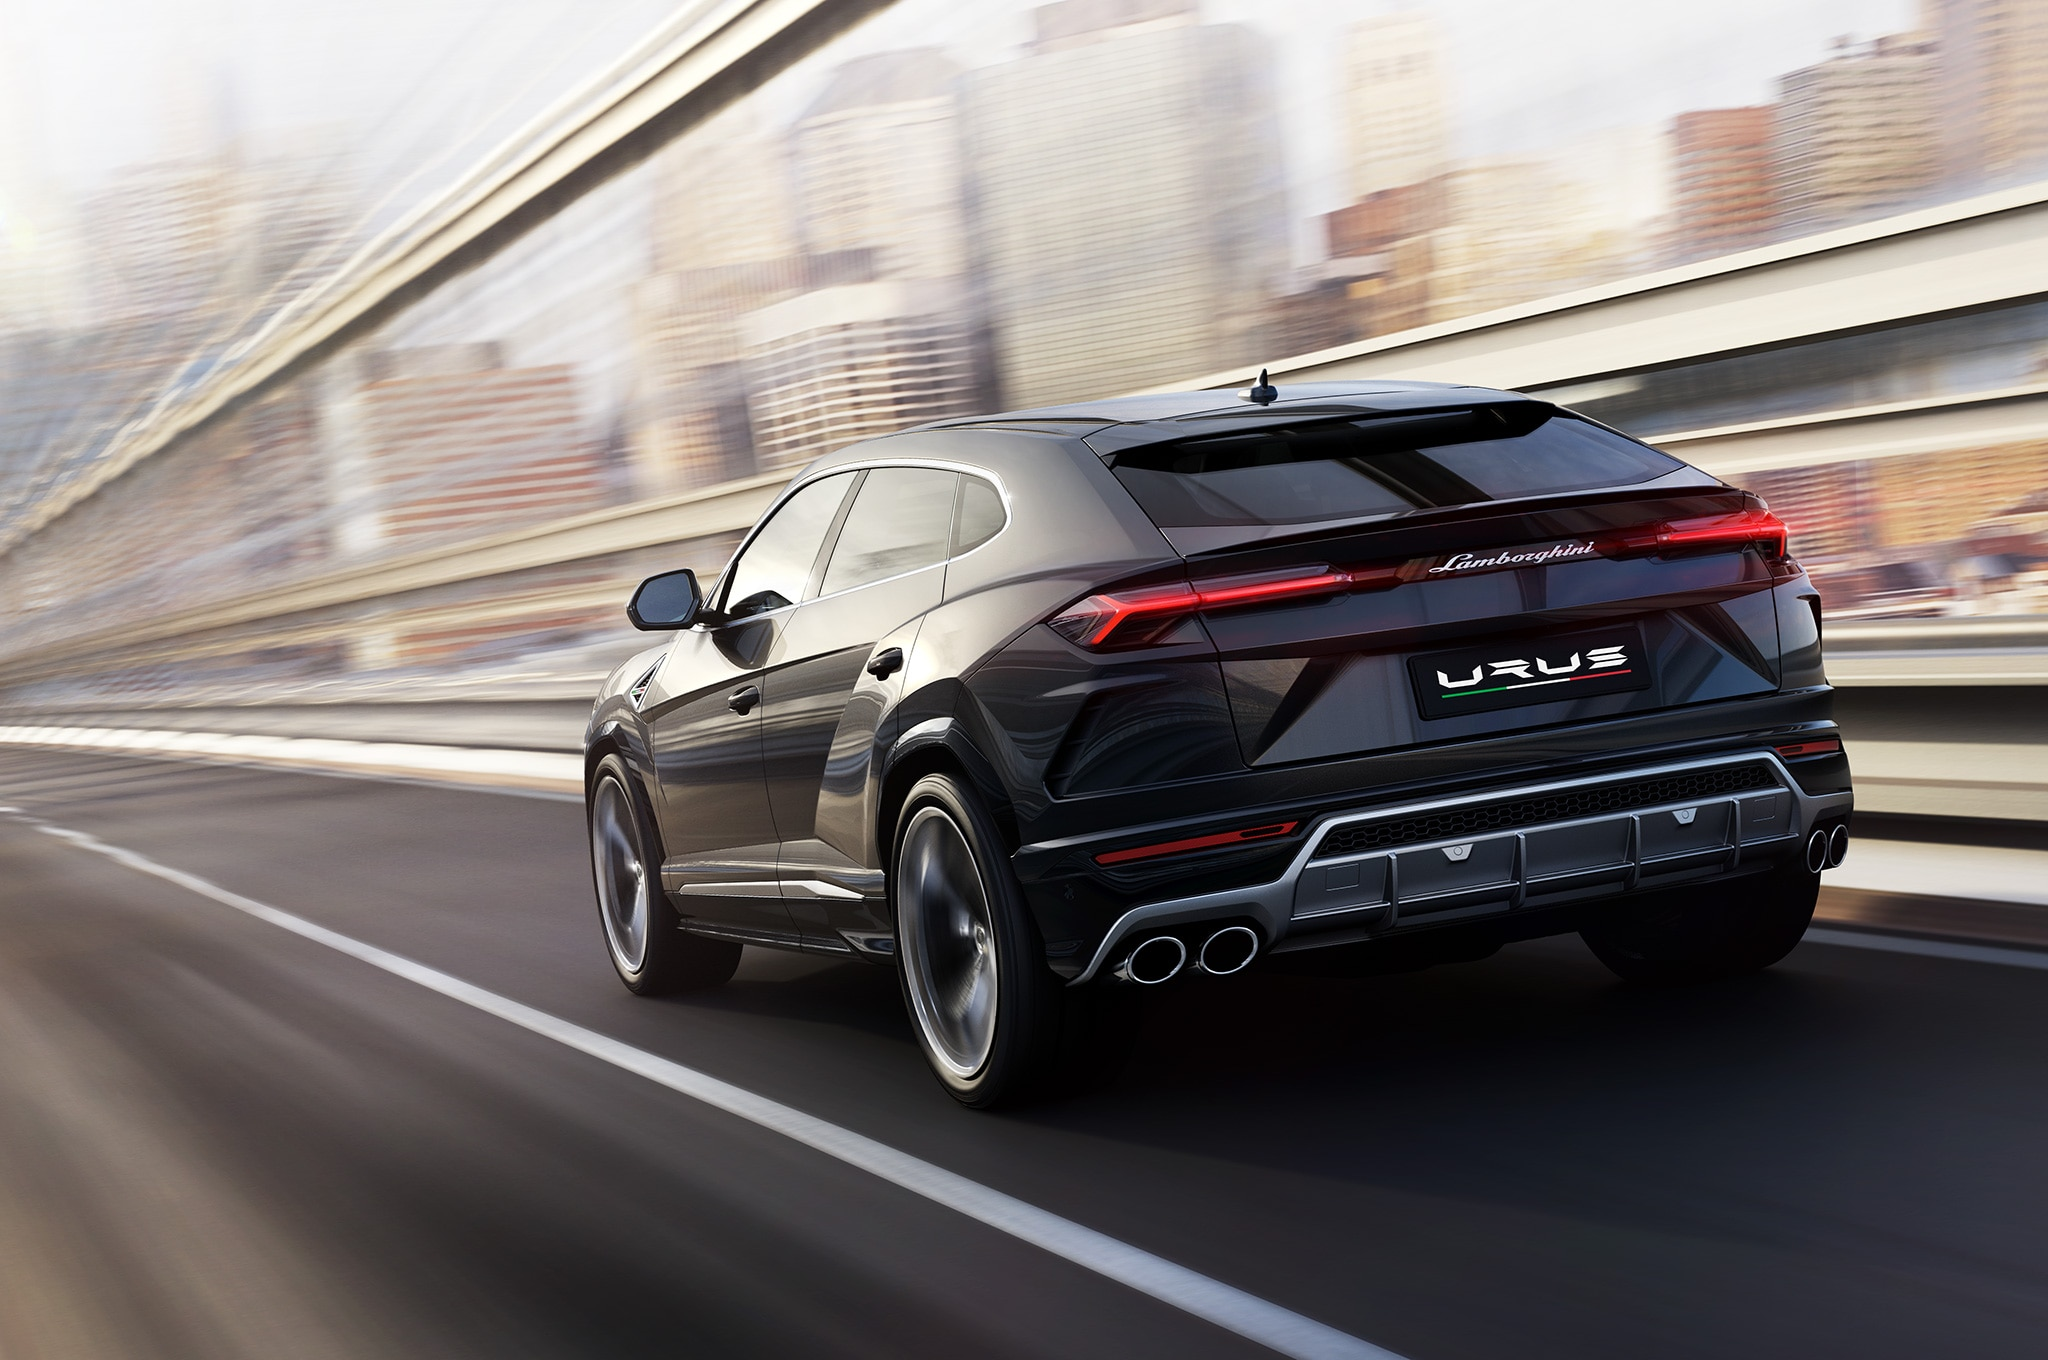 2019 Lamborghini Urus Rear Side View In Motion